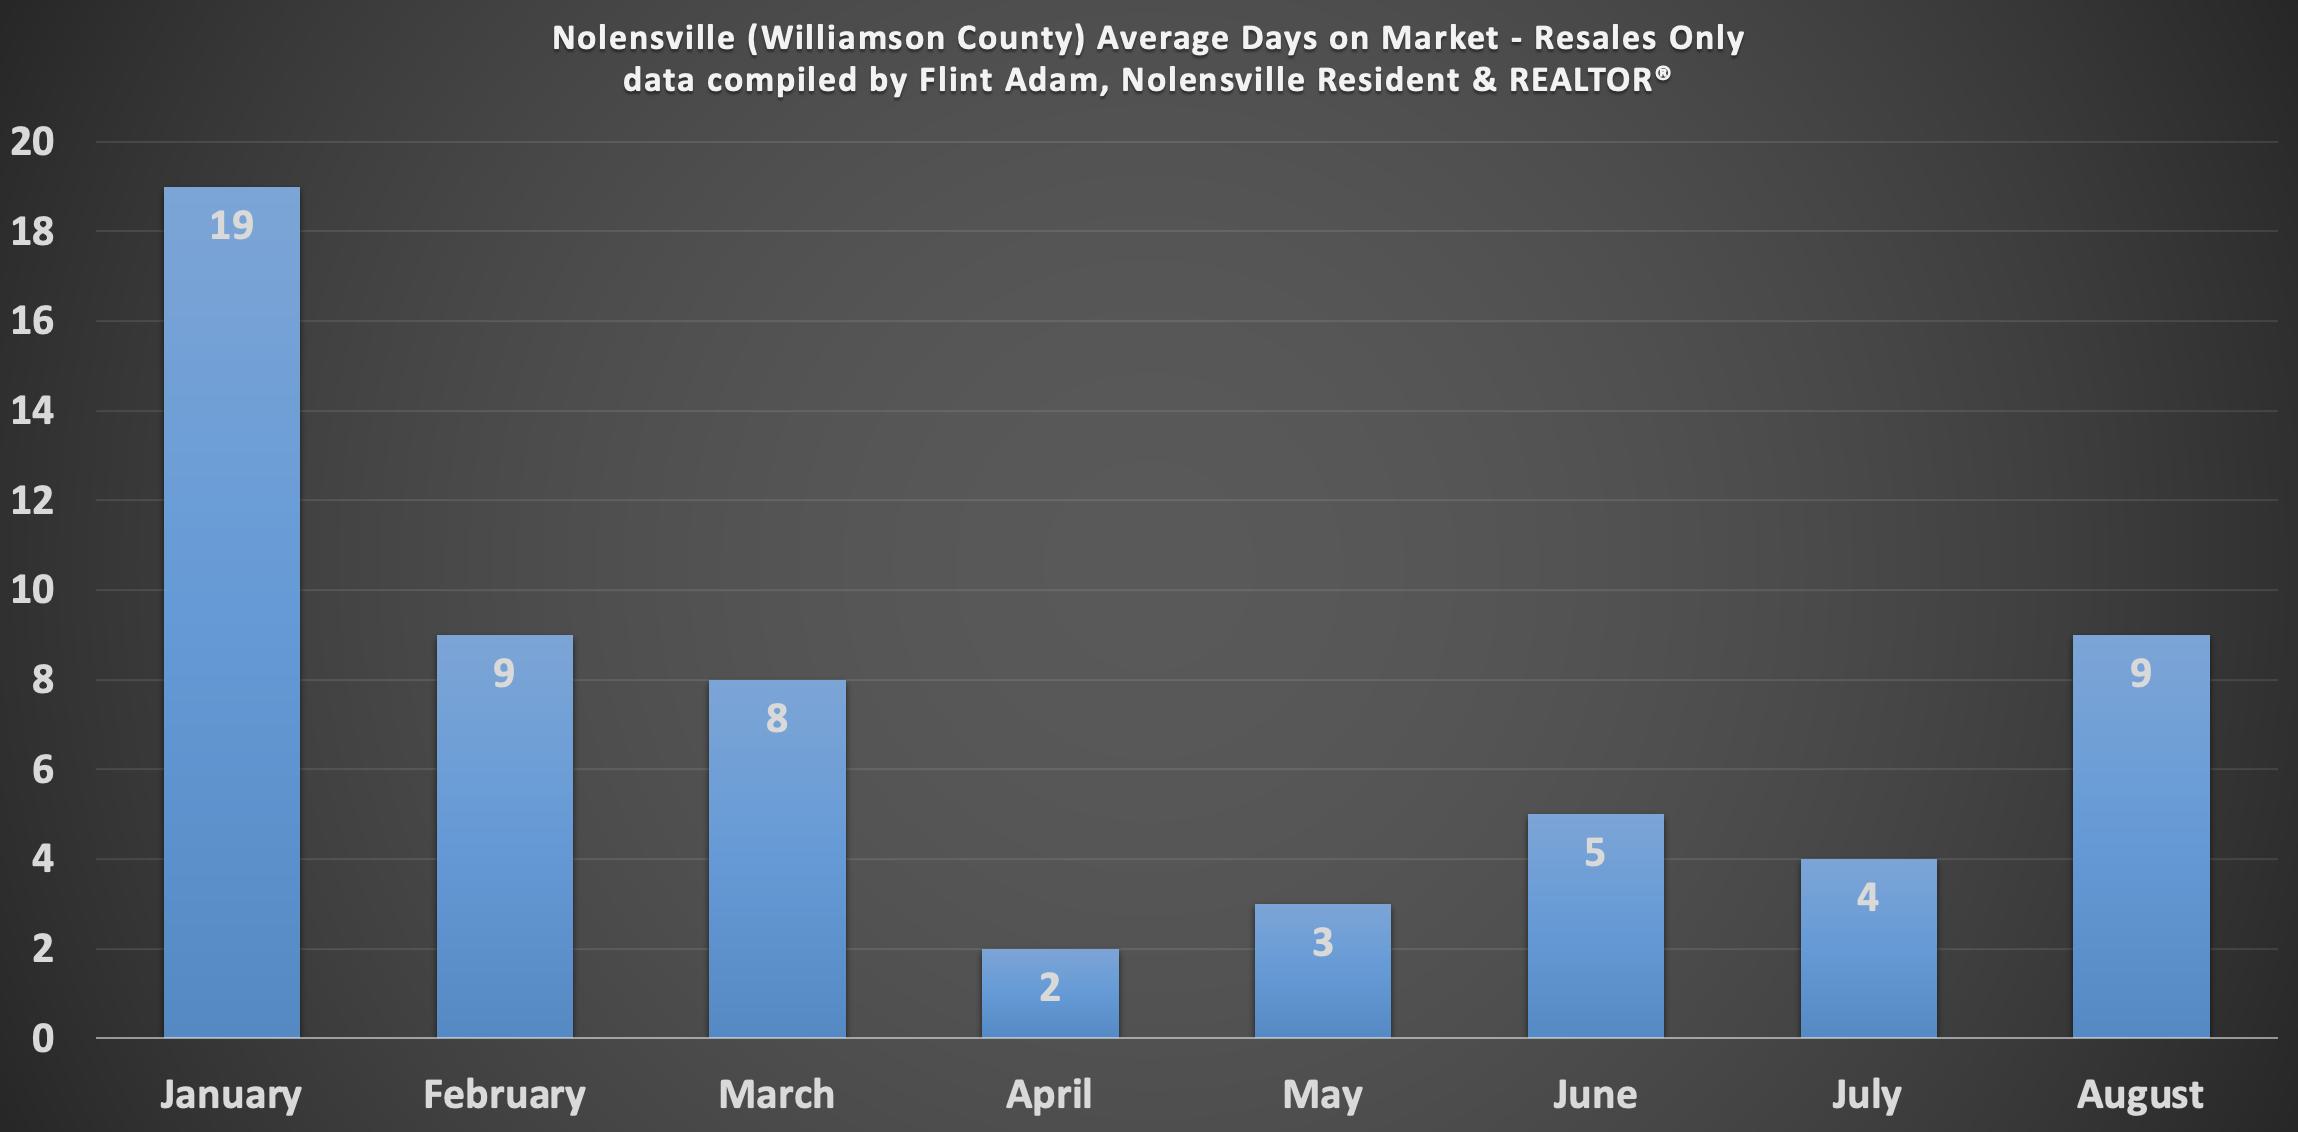 Nolensville August 2021 Residential Average Days on Market